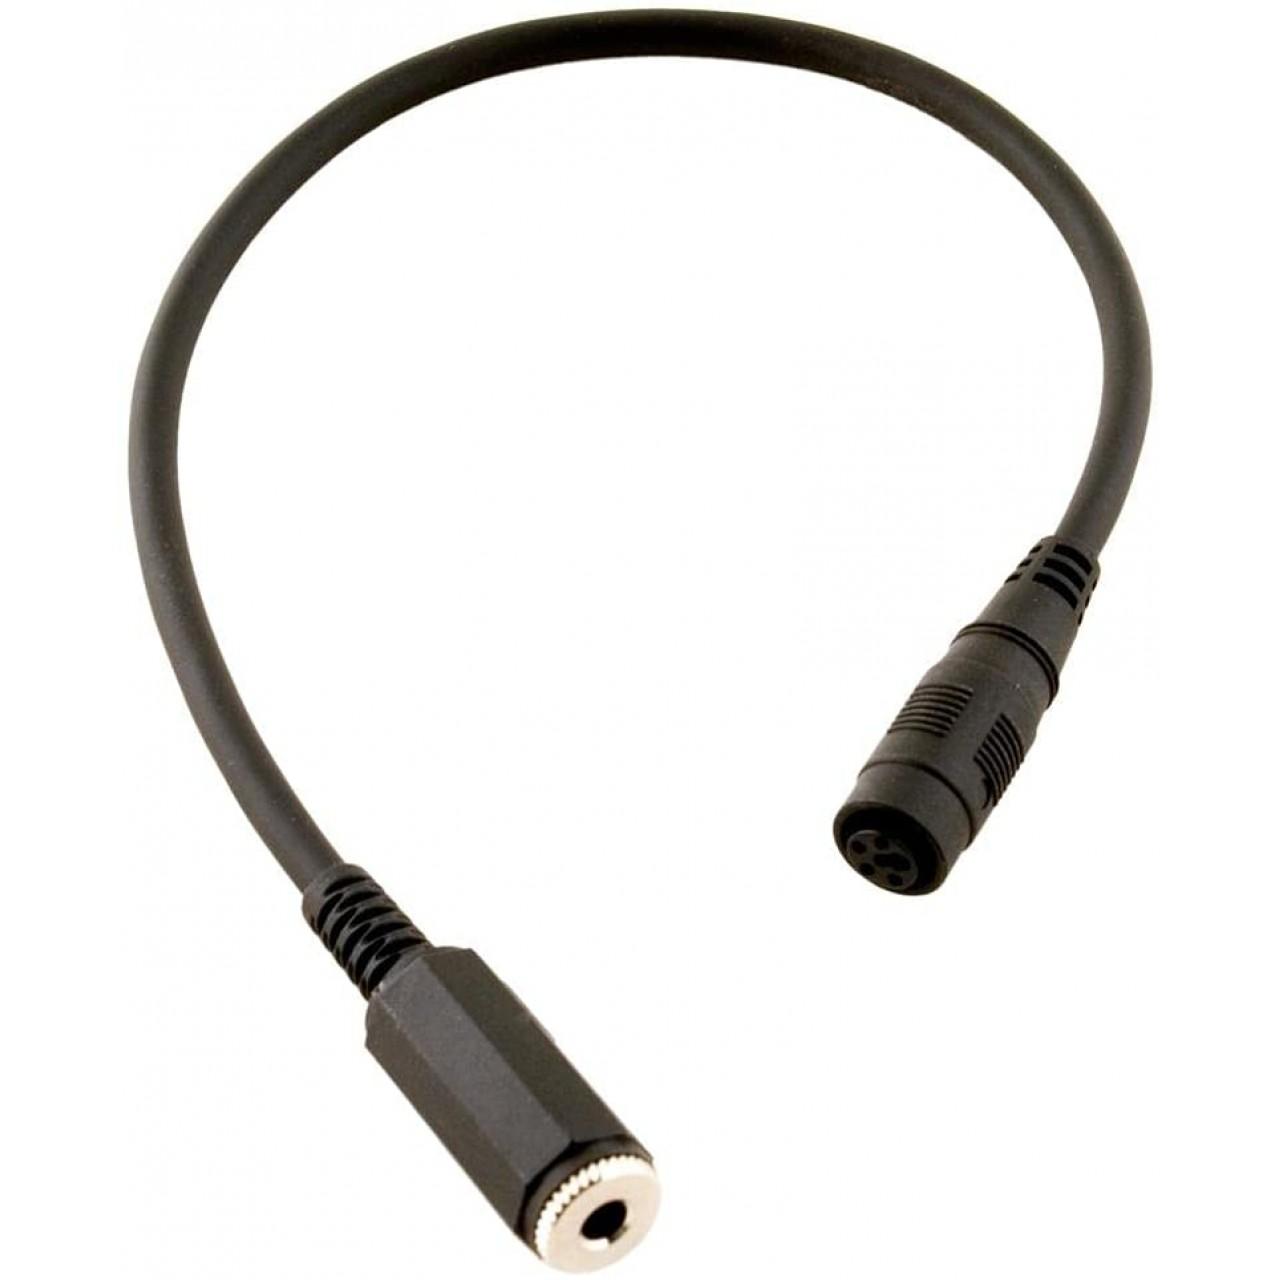 OPC-922 Cords - ICOM